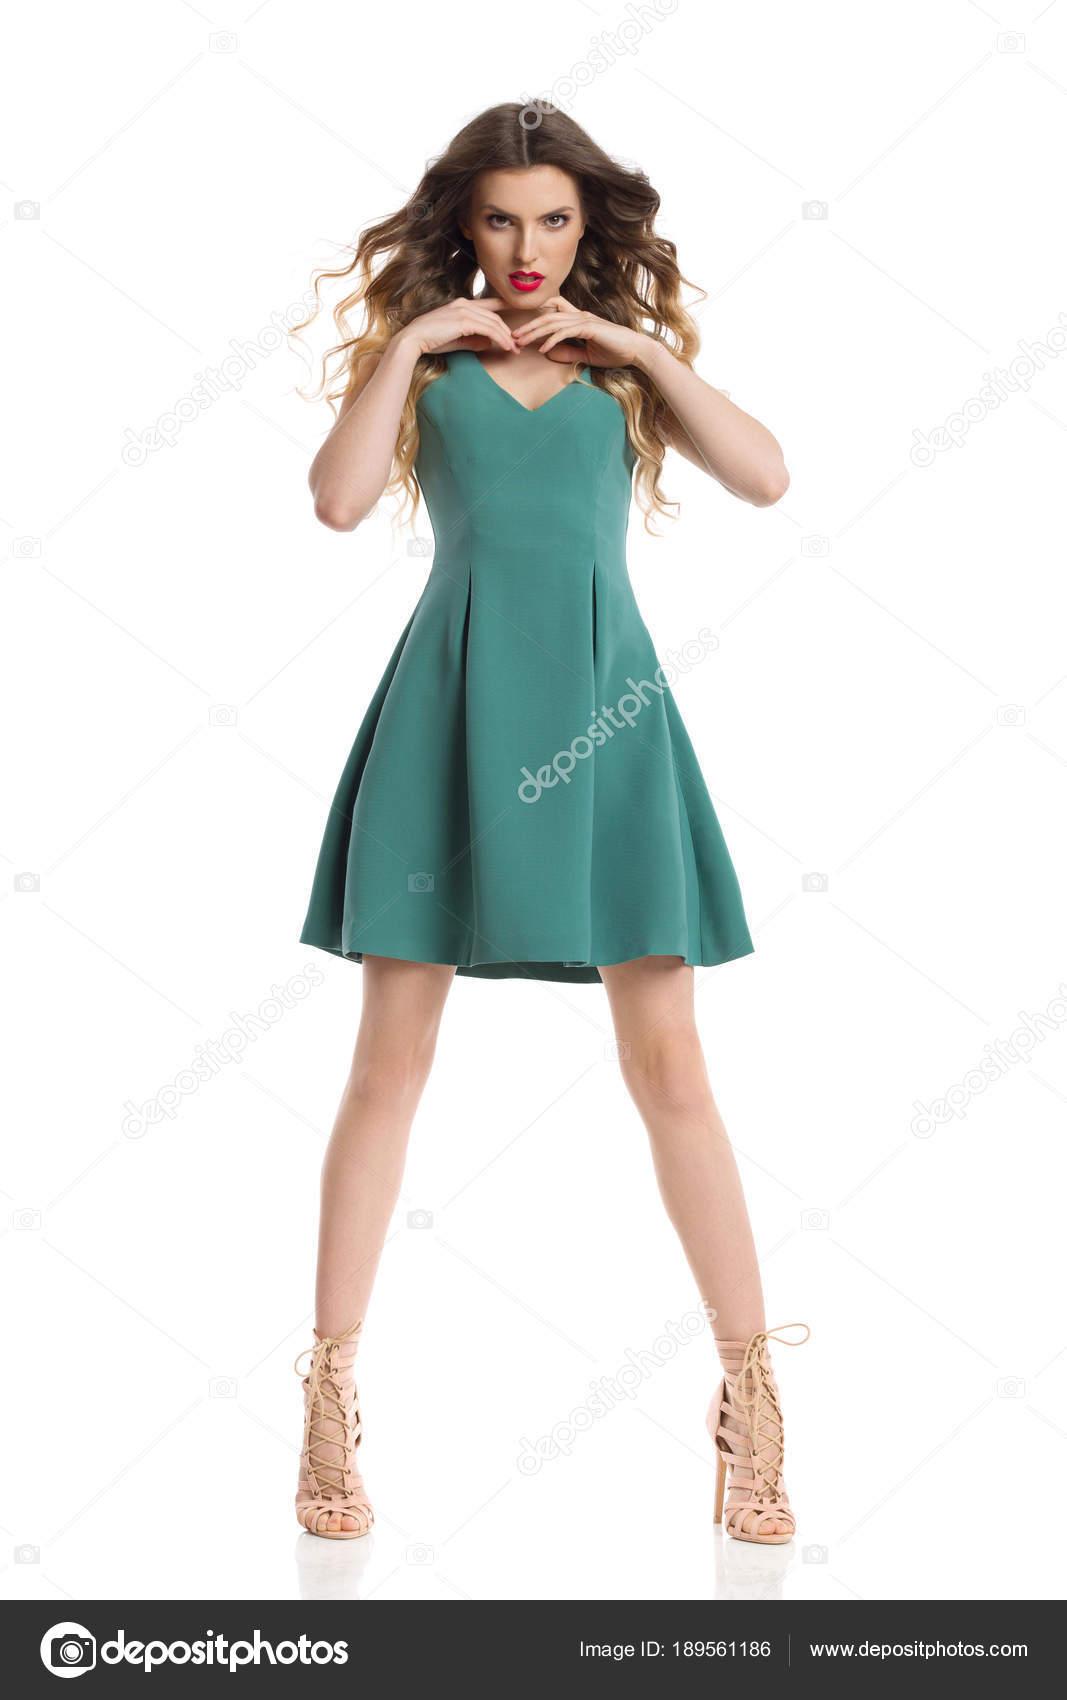 Vestidos verdes con zapatos